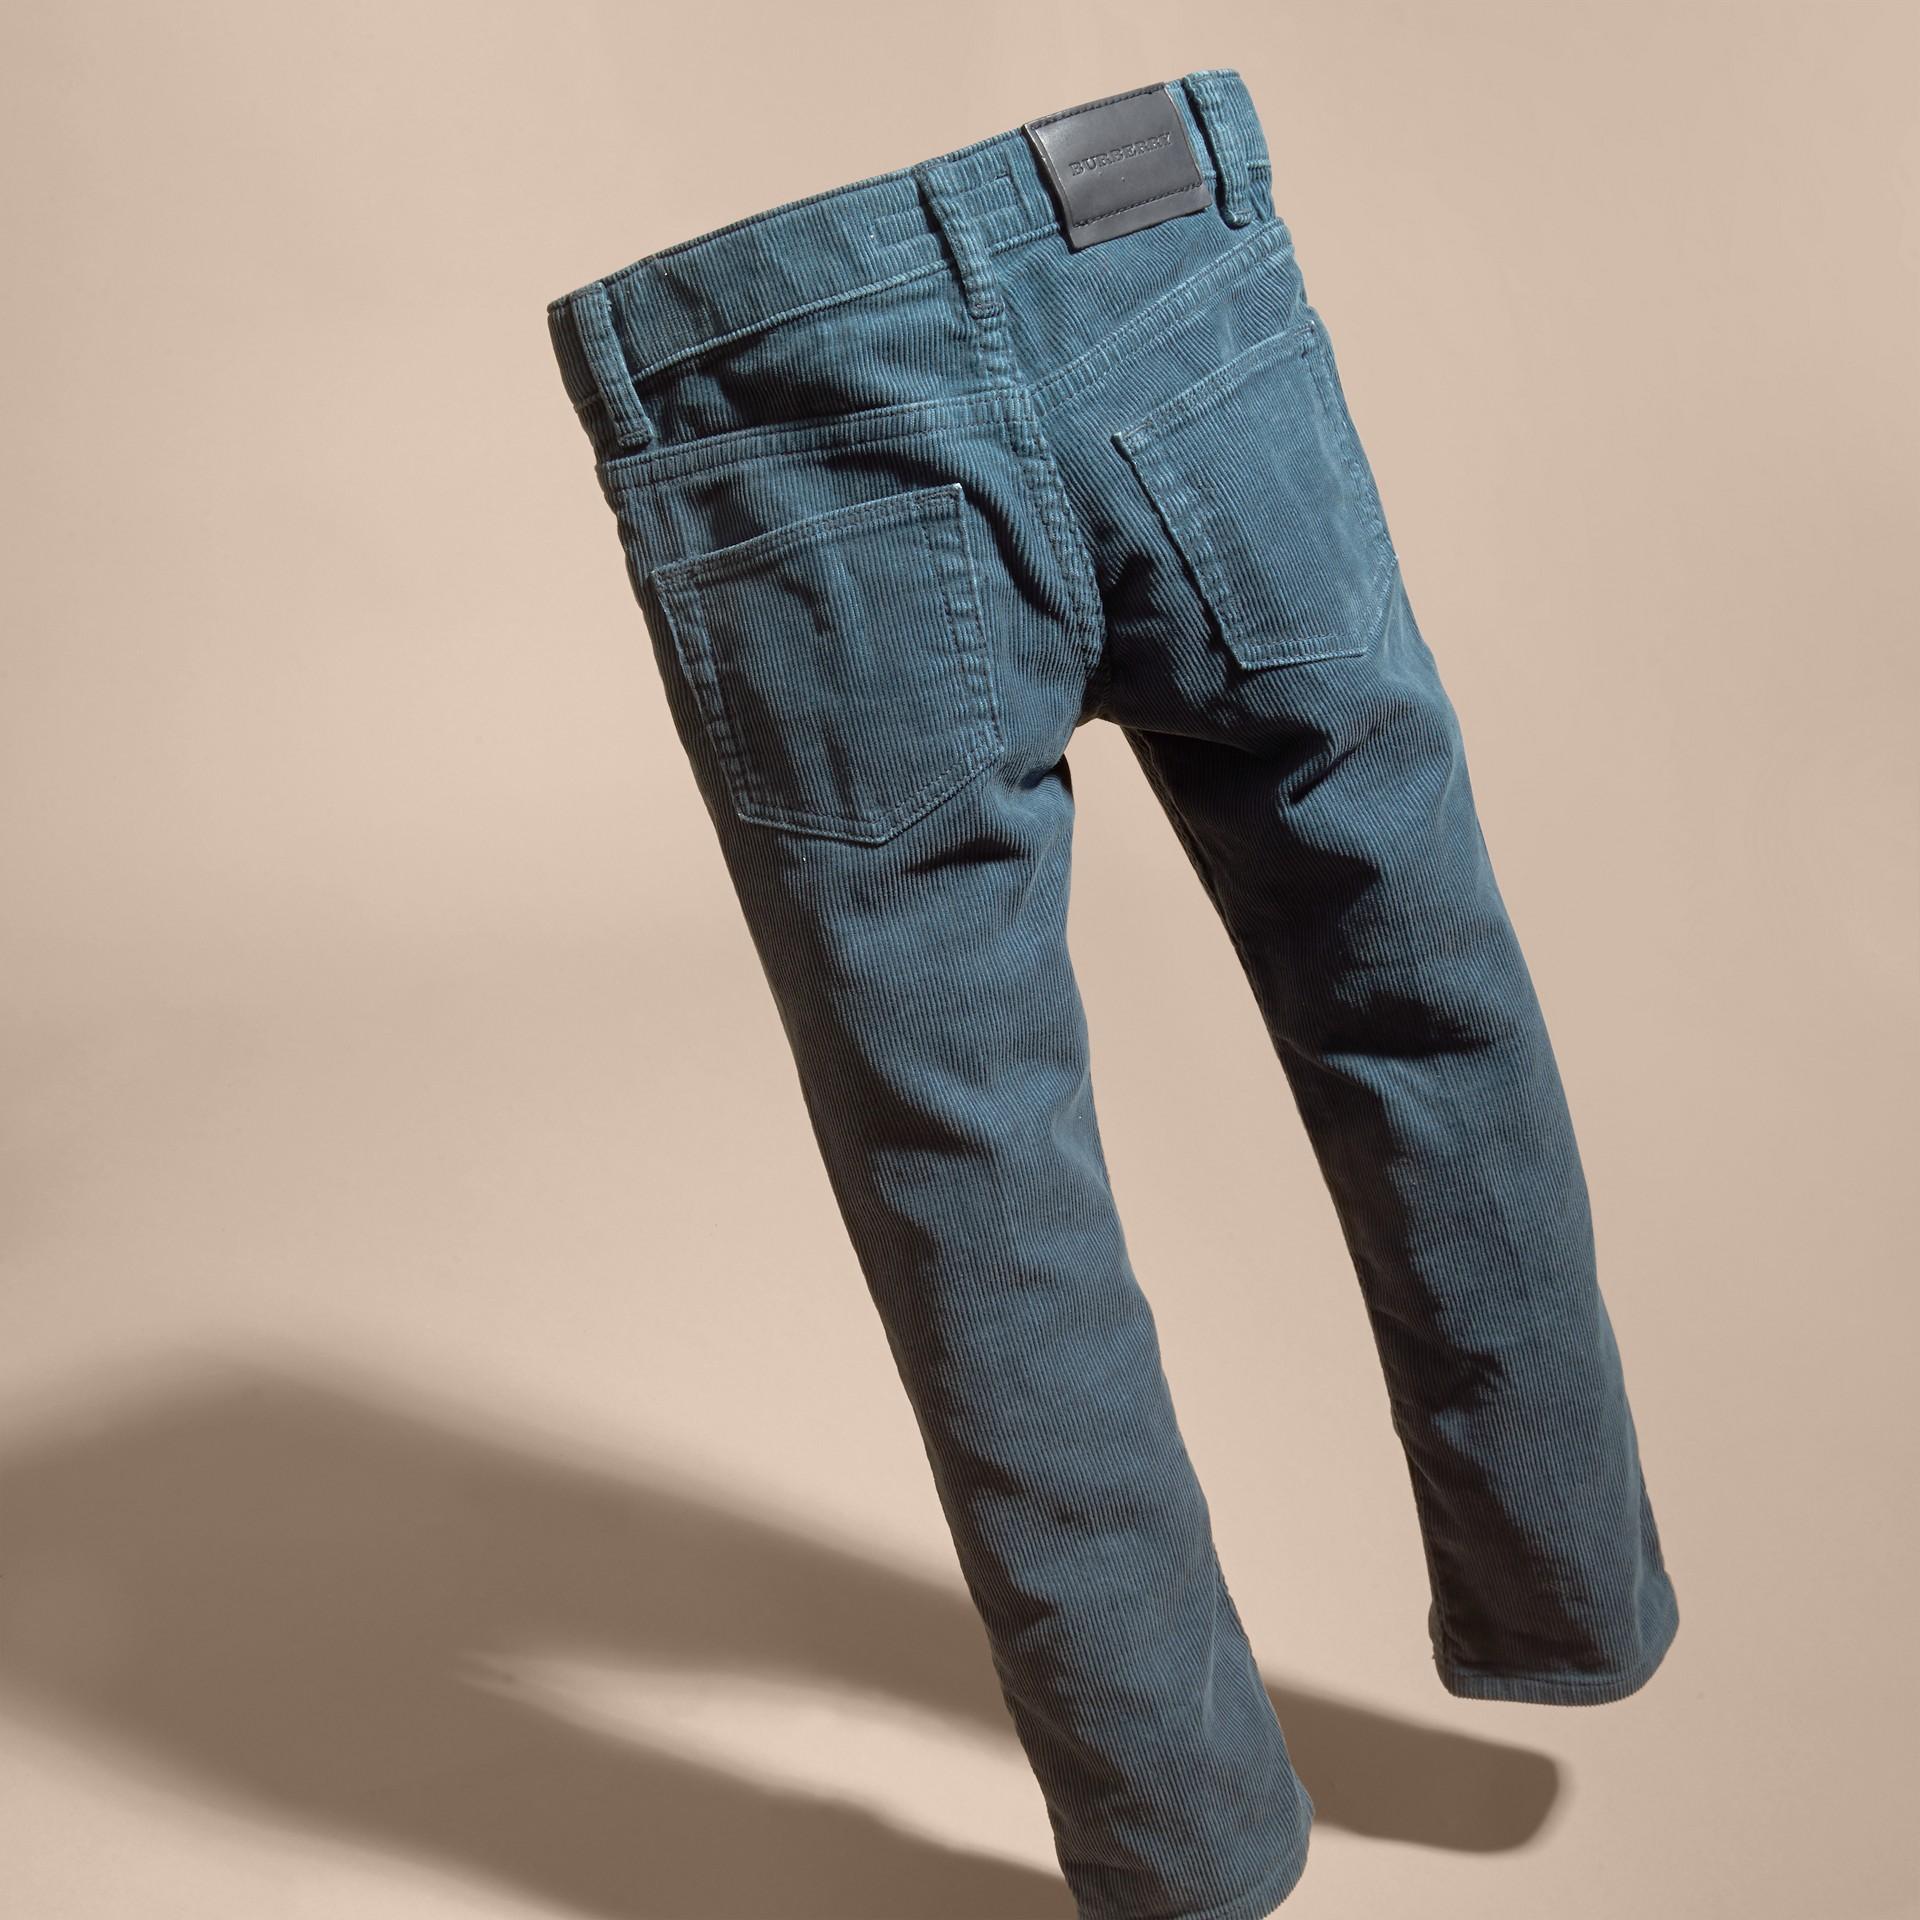 Blu minerale Jeans in corduroy stretch Blu Minerale - immagine della galleria 4